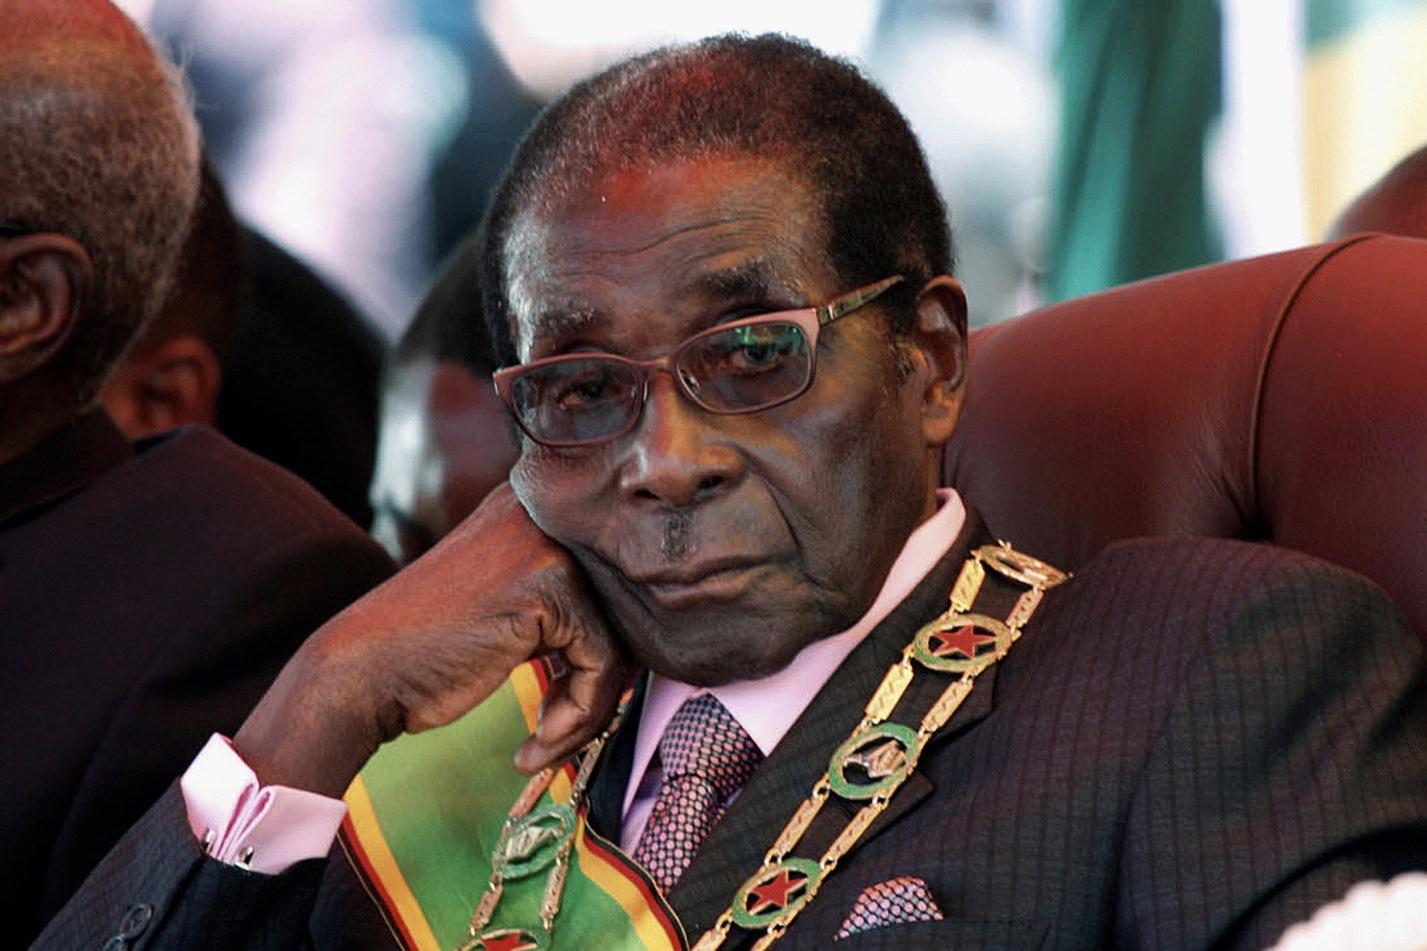 NewsFeeds24,BreakingNews,impeachment,Harare,Parliment,Mugabe Resigns,Robert Mugabe,Zimbabwe,